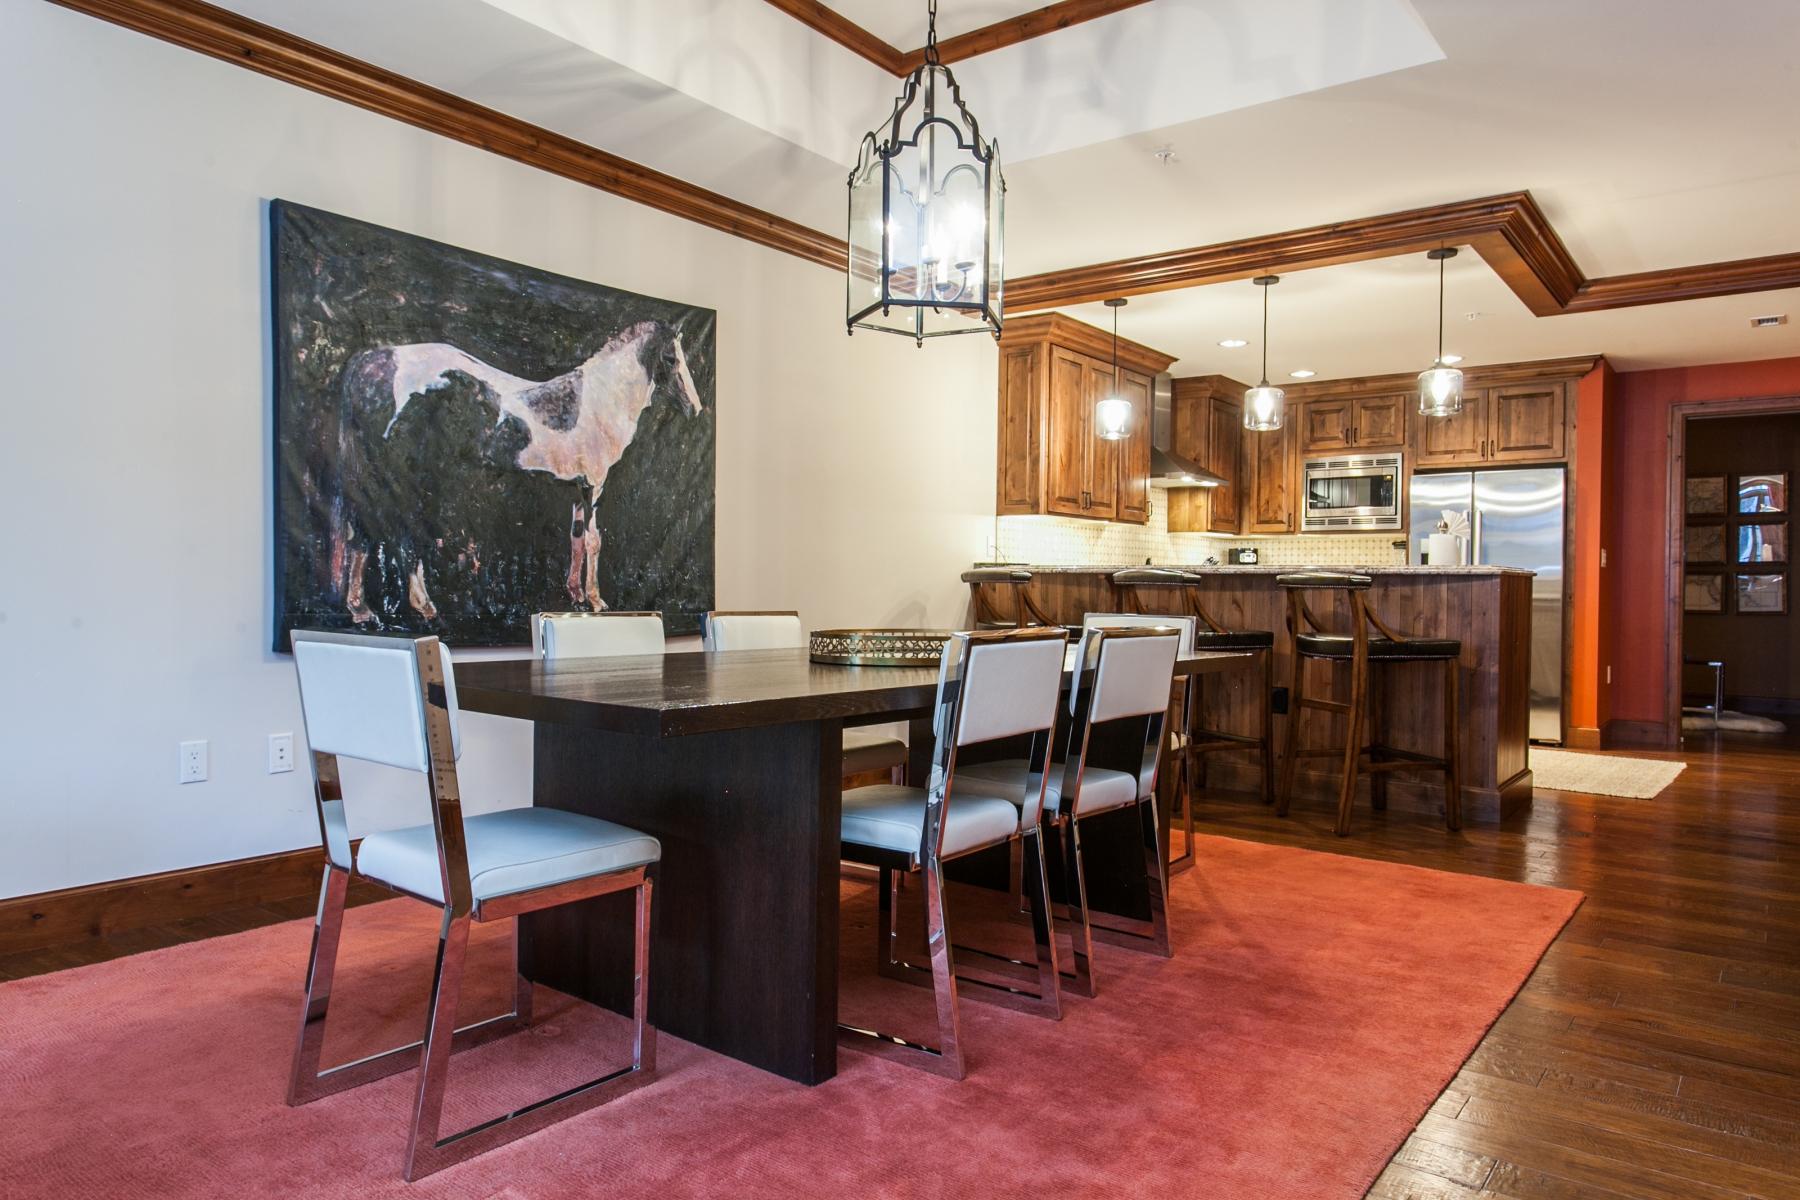 Condomínio para Venda às Ritz Carlton Residences, Vail 728 West Lionshead Circle #7 Lionshead, Vail, Colorado, 81657 Estados Unidos